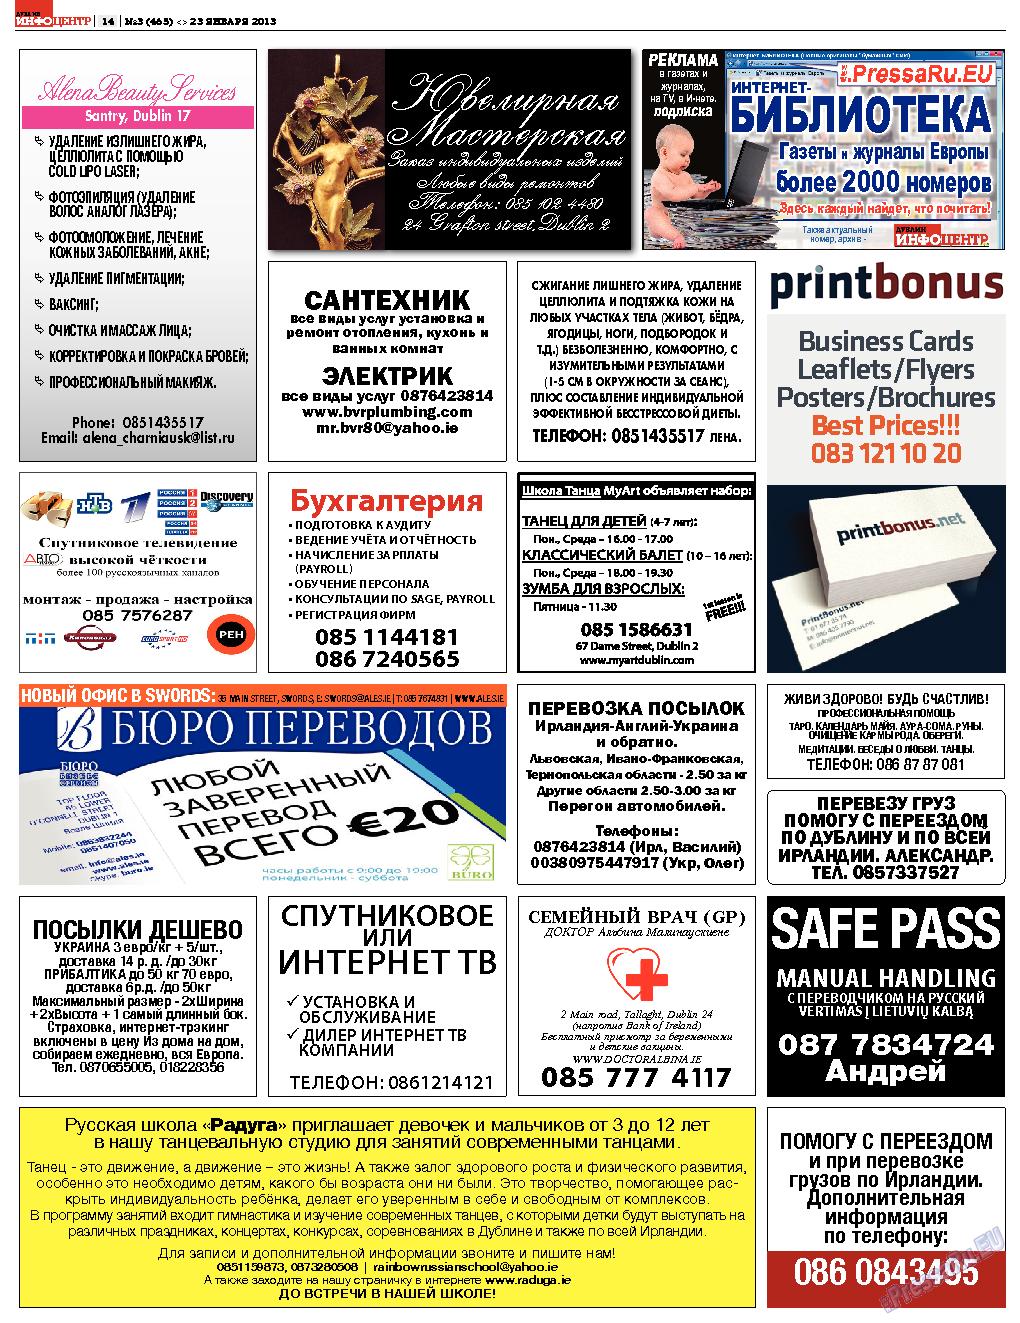 Дублин инфоцентр (газета). 2013 год, номер 3, стр. 14